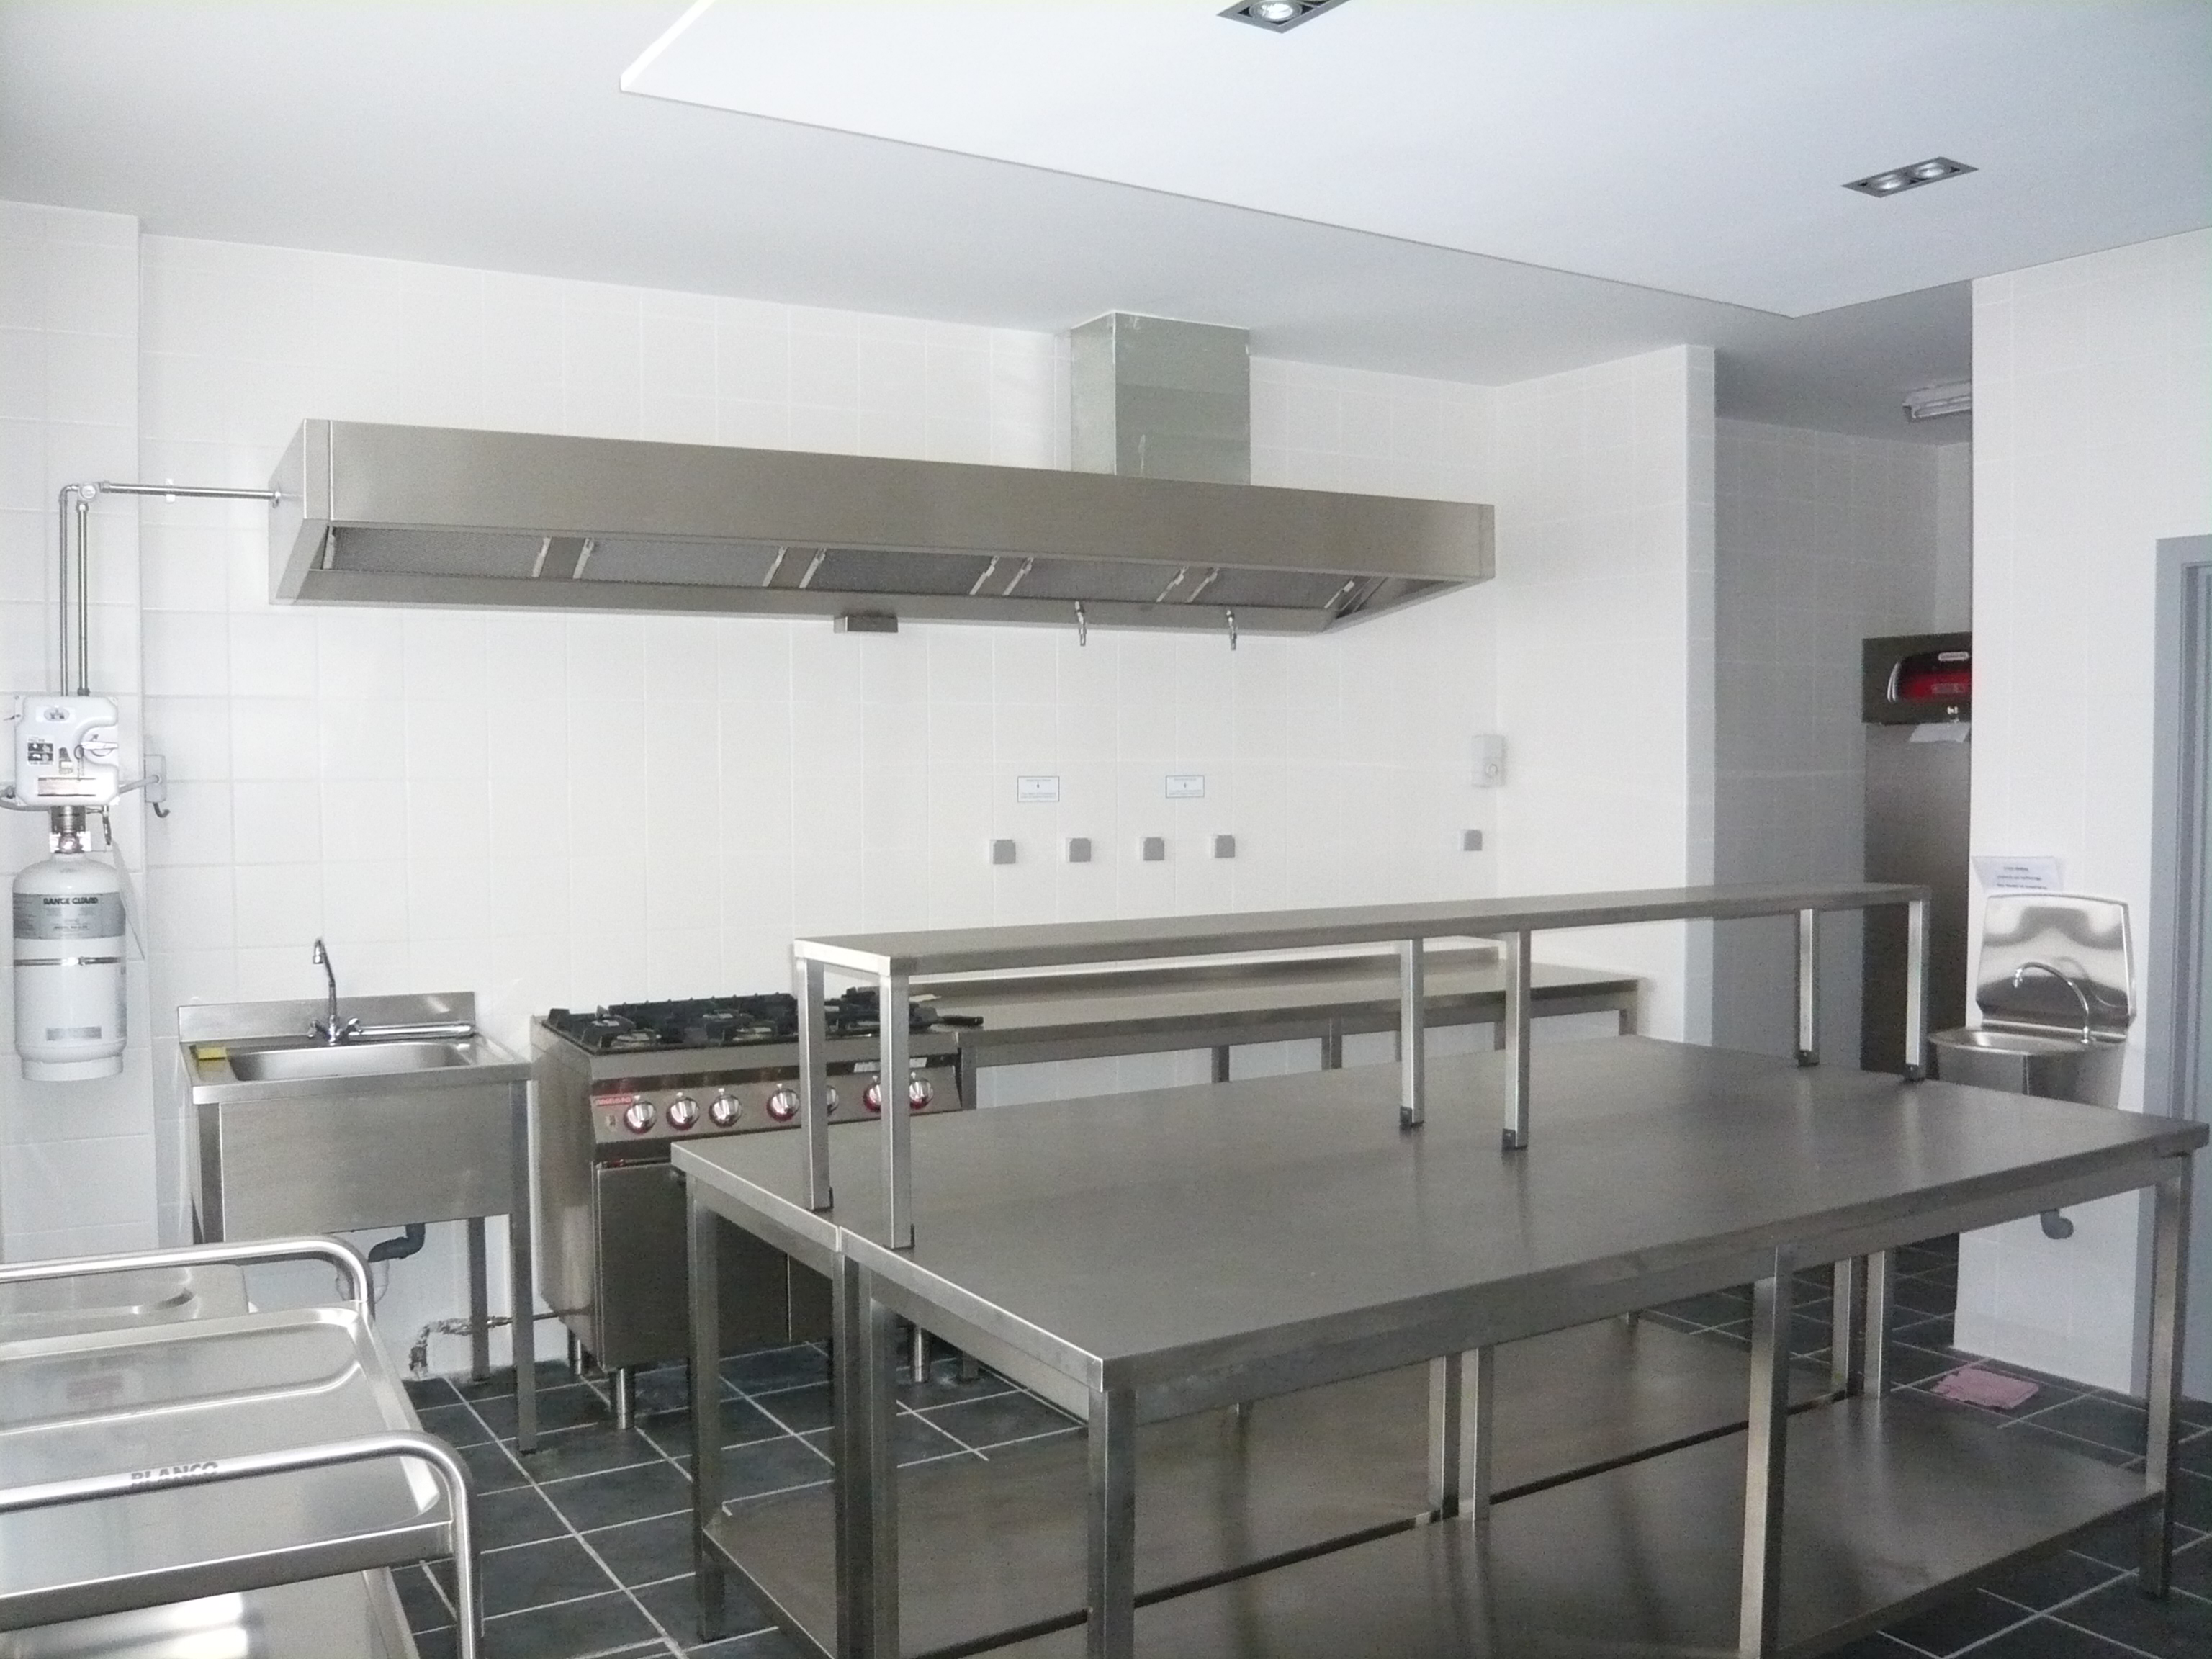 Location materiel cuisine tournai - Location materiel cuisine professionnel ...